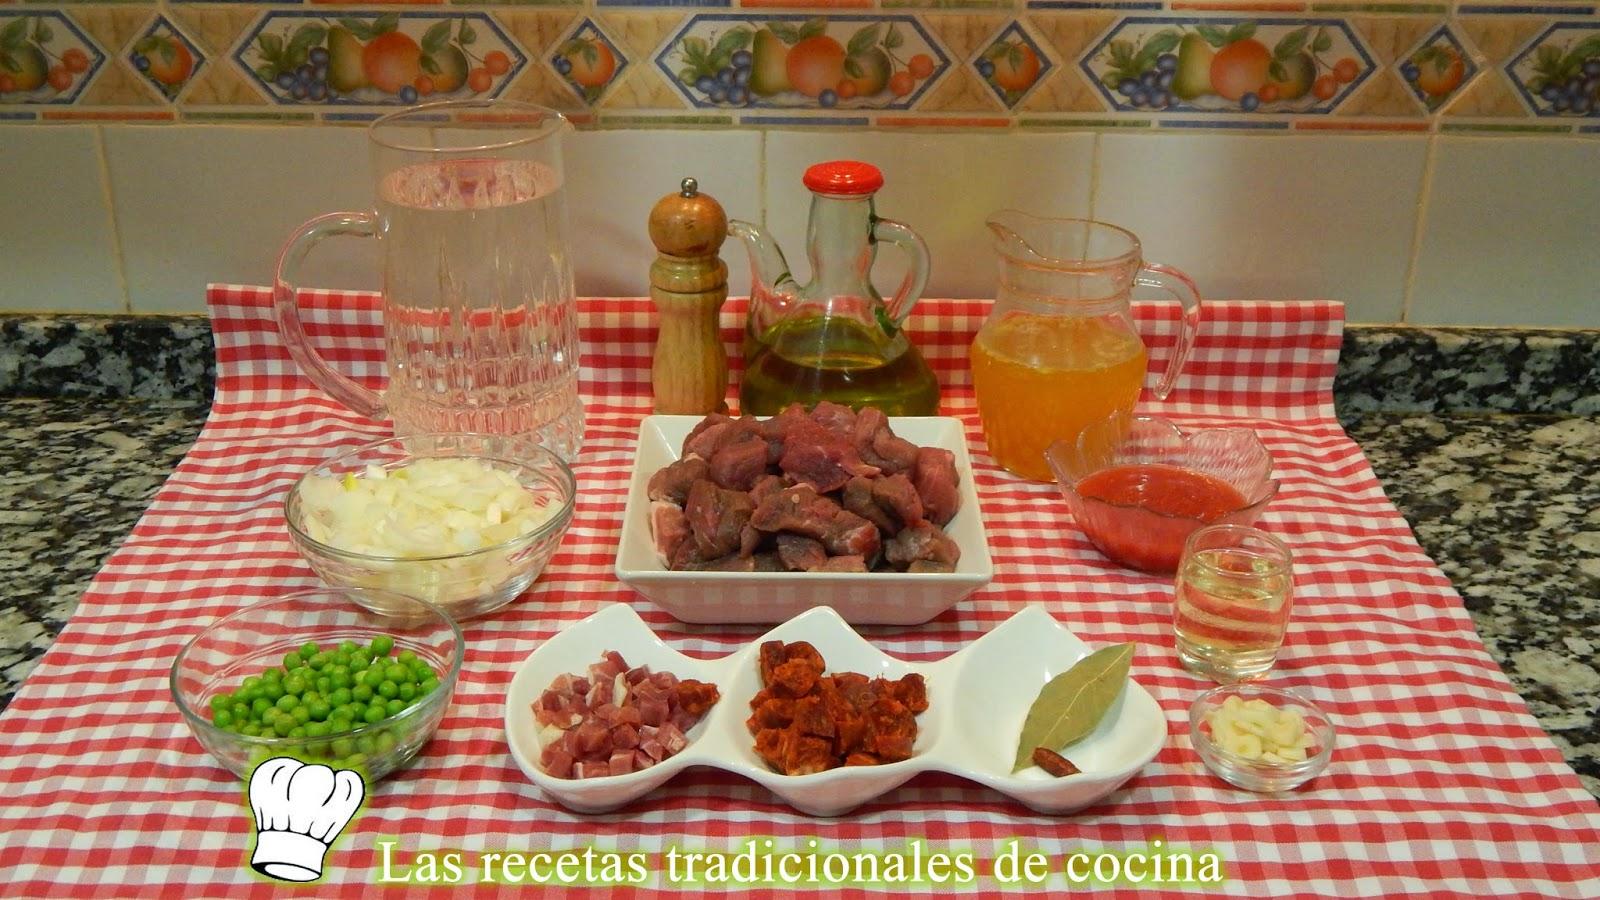 Receta fácil de ternera en salsa o carcamusa Toledana